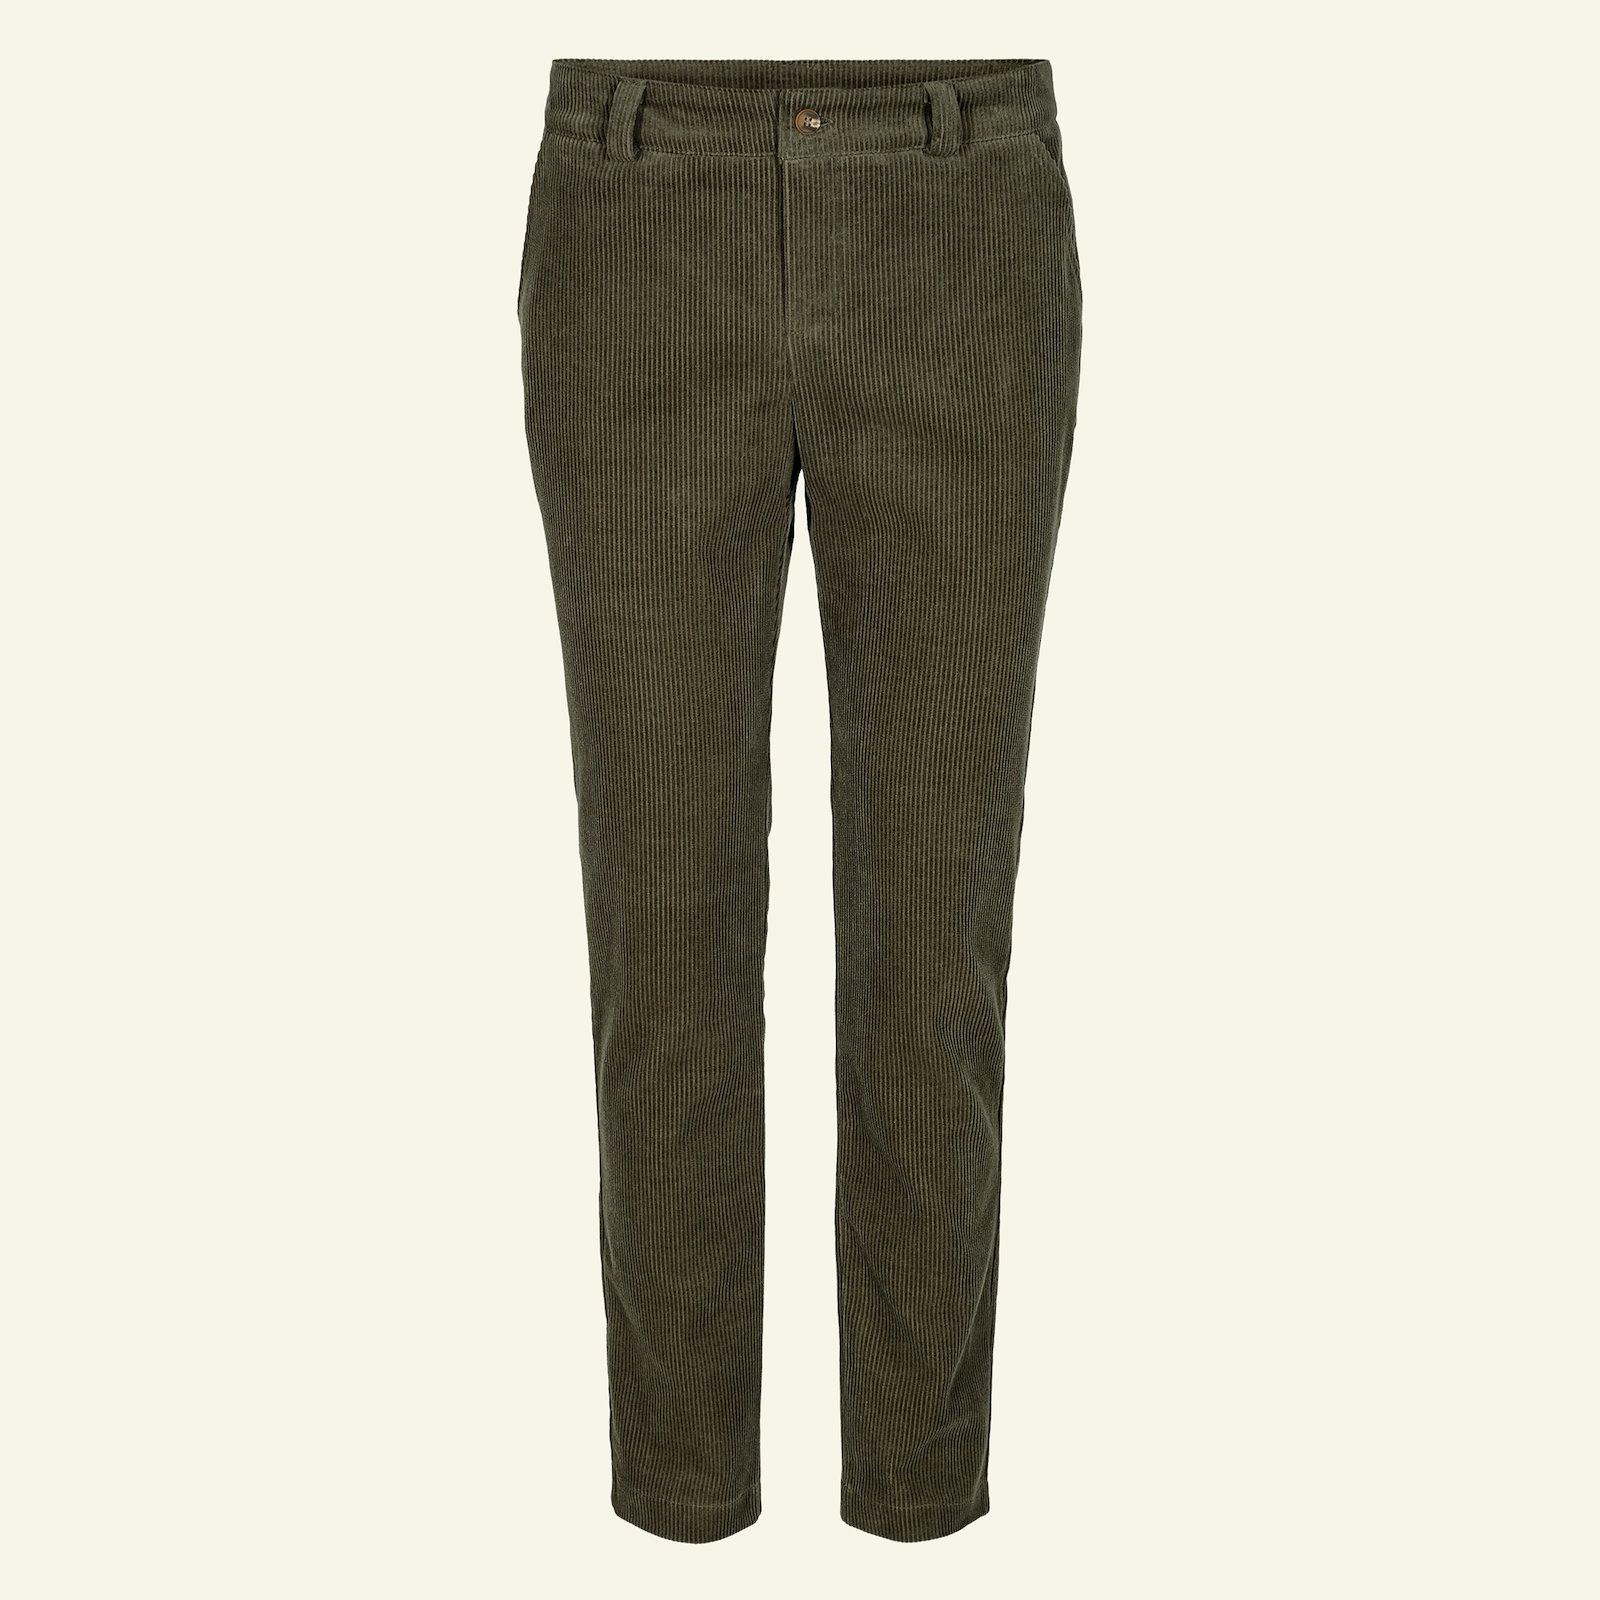 Trousers, 44/16 p20033_430000_sskit